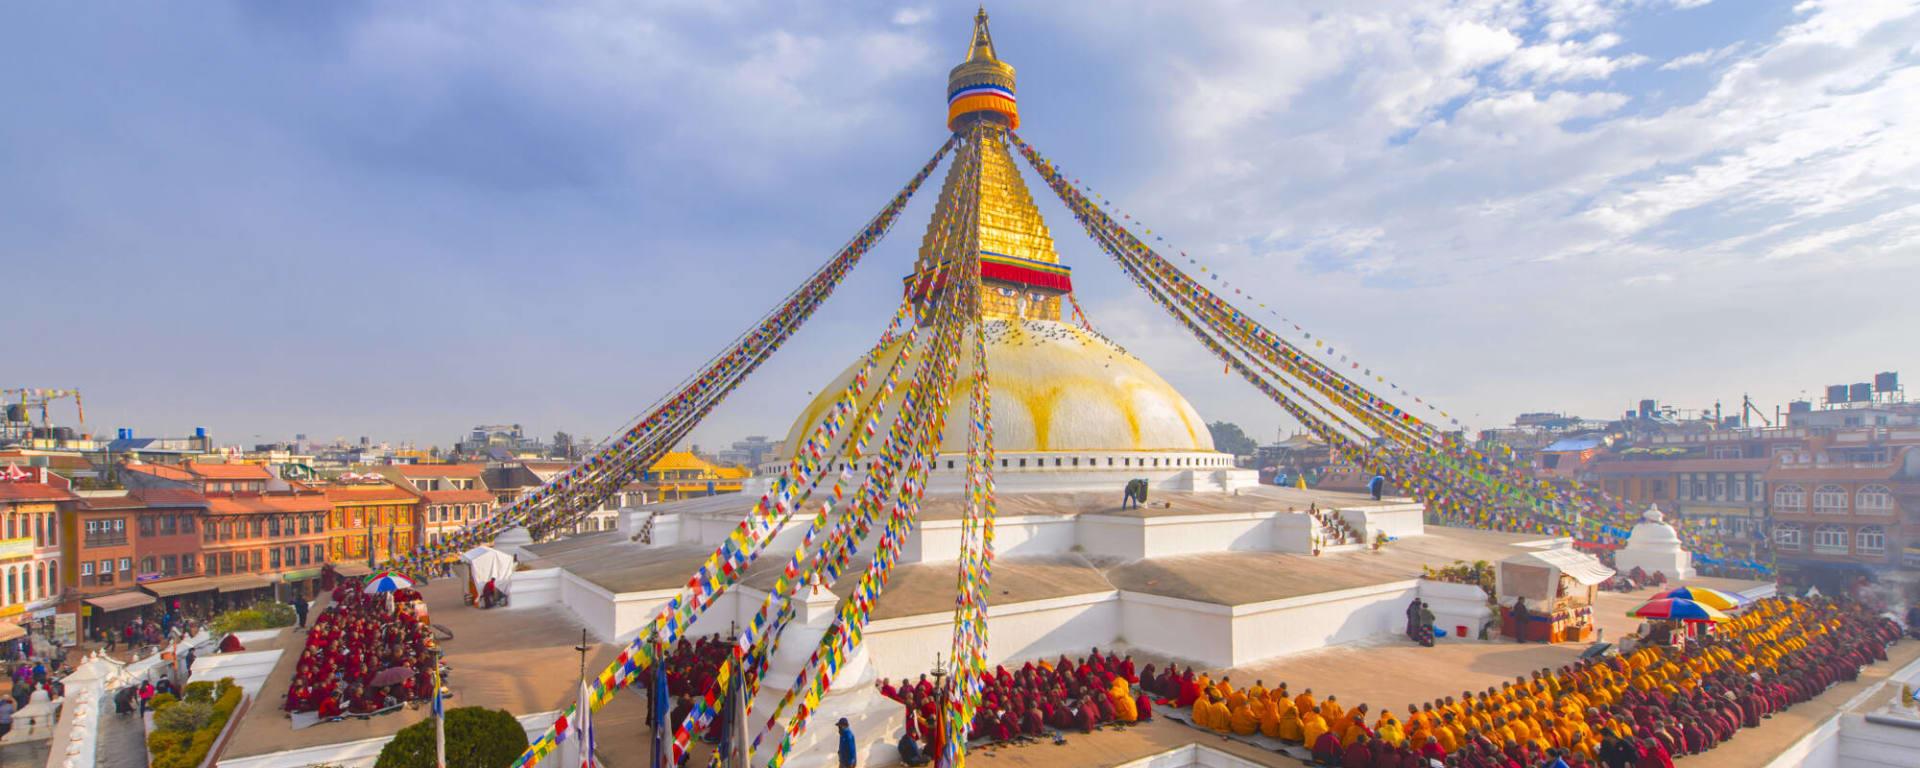 Nepal entdecken mit Tischler Reisen: Nepal Kathmandu Boudhanath Stupa